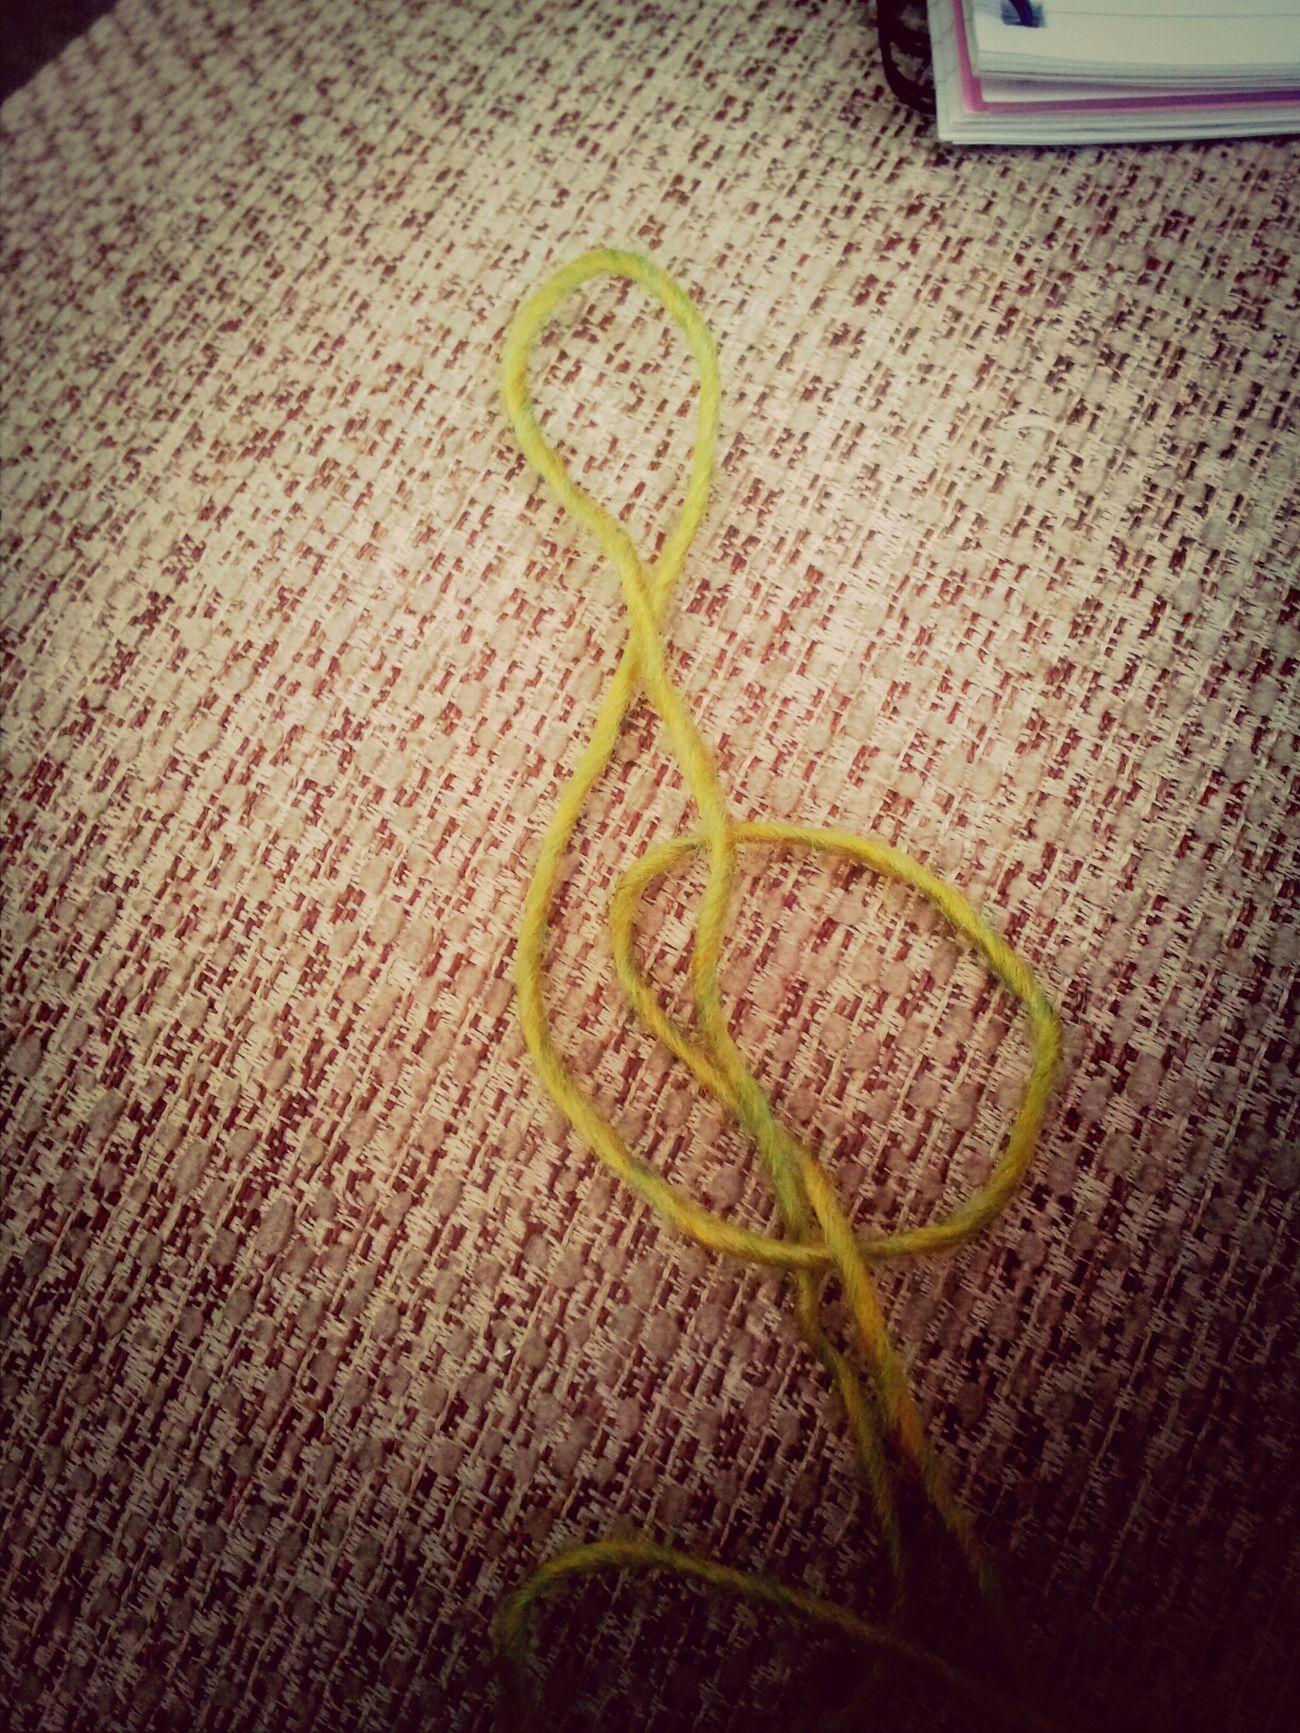 My wool makes music? Taking Photos Knitting Relaxing Music